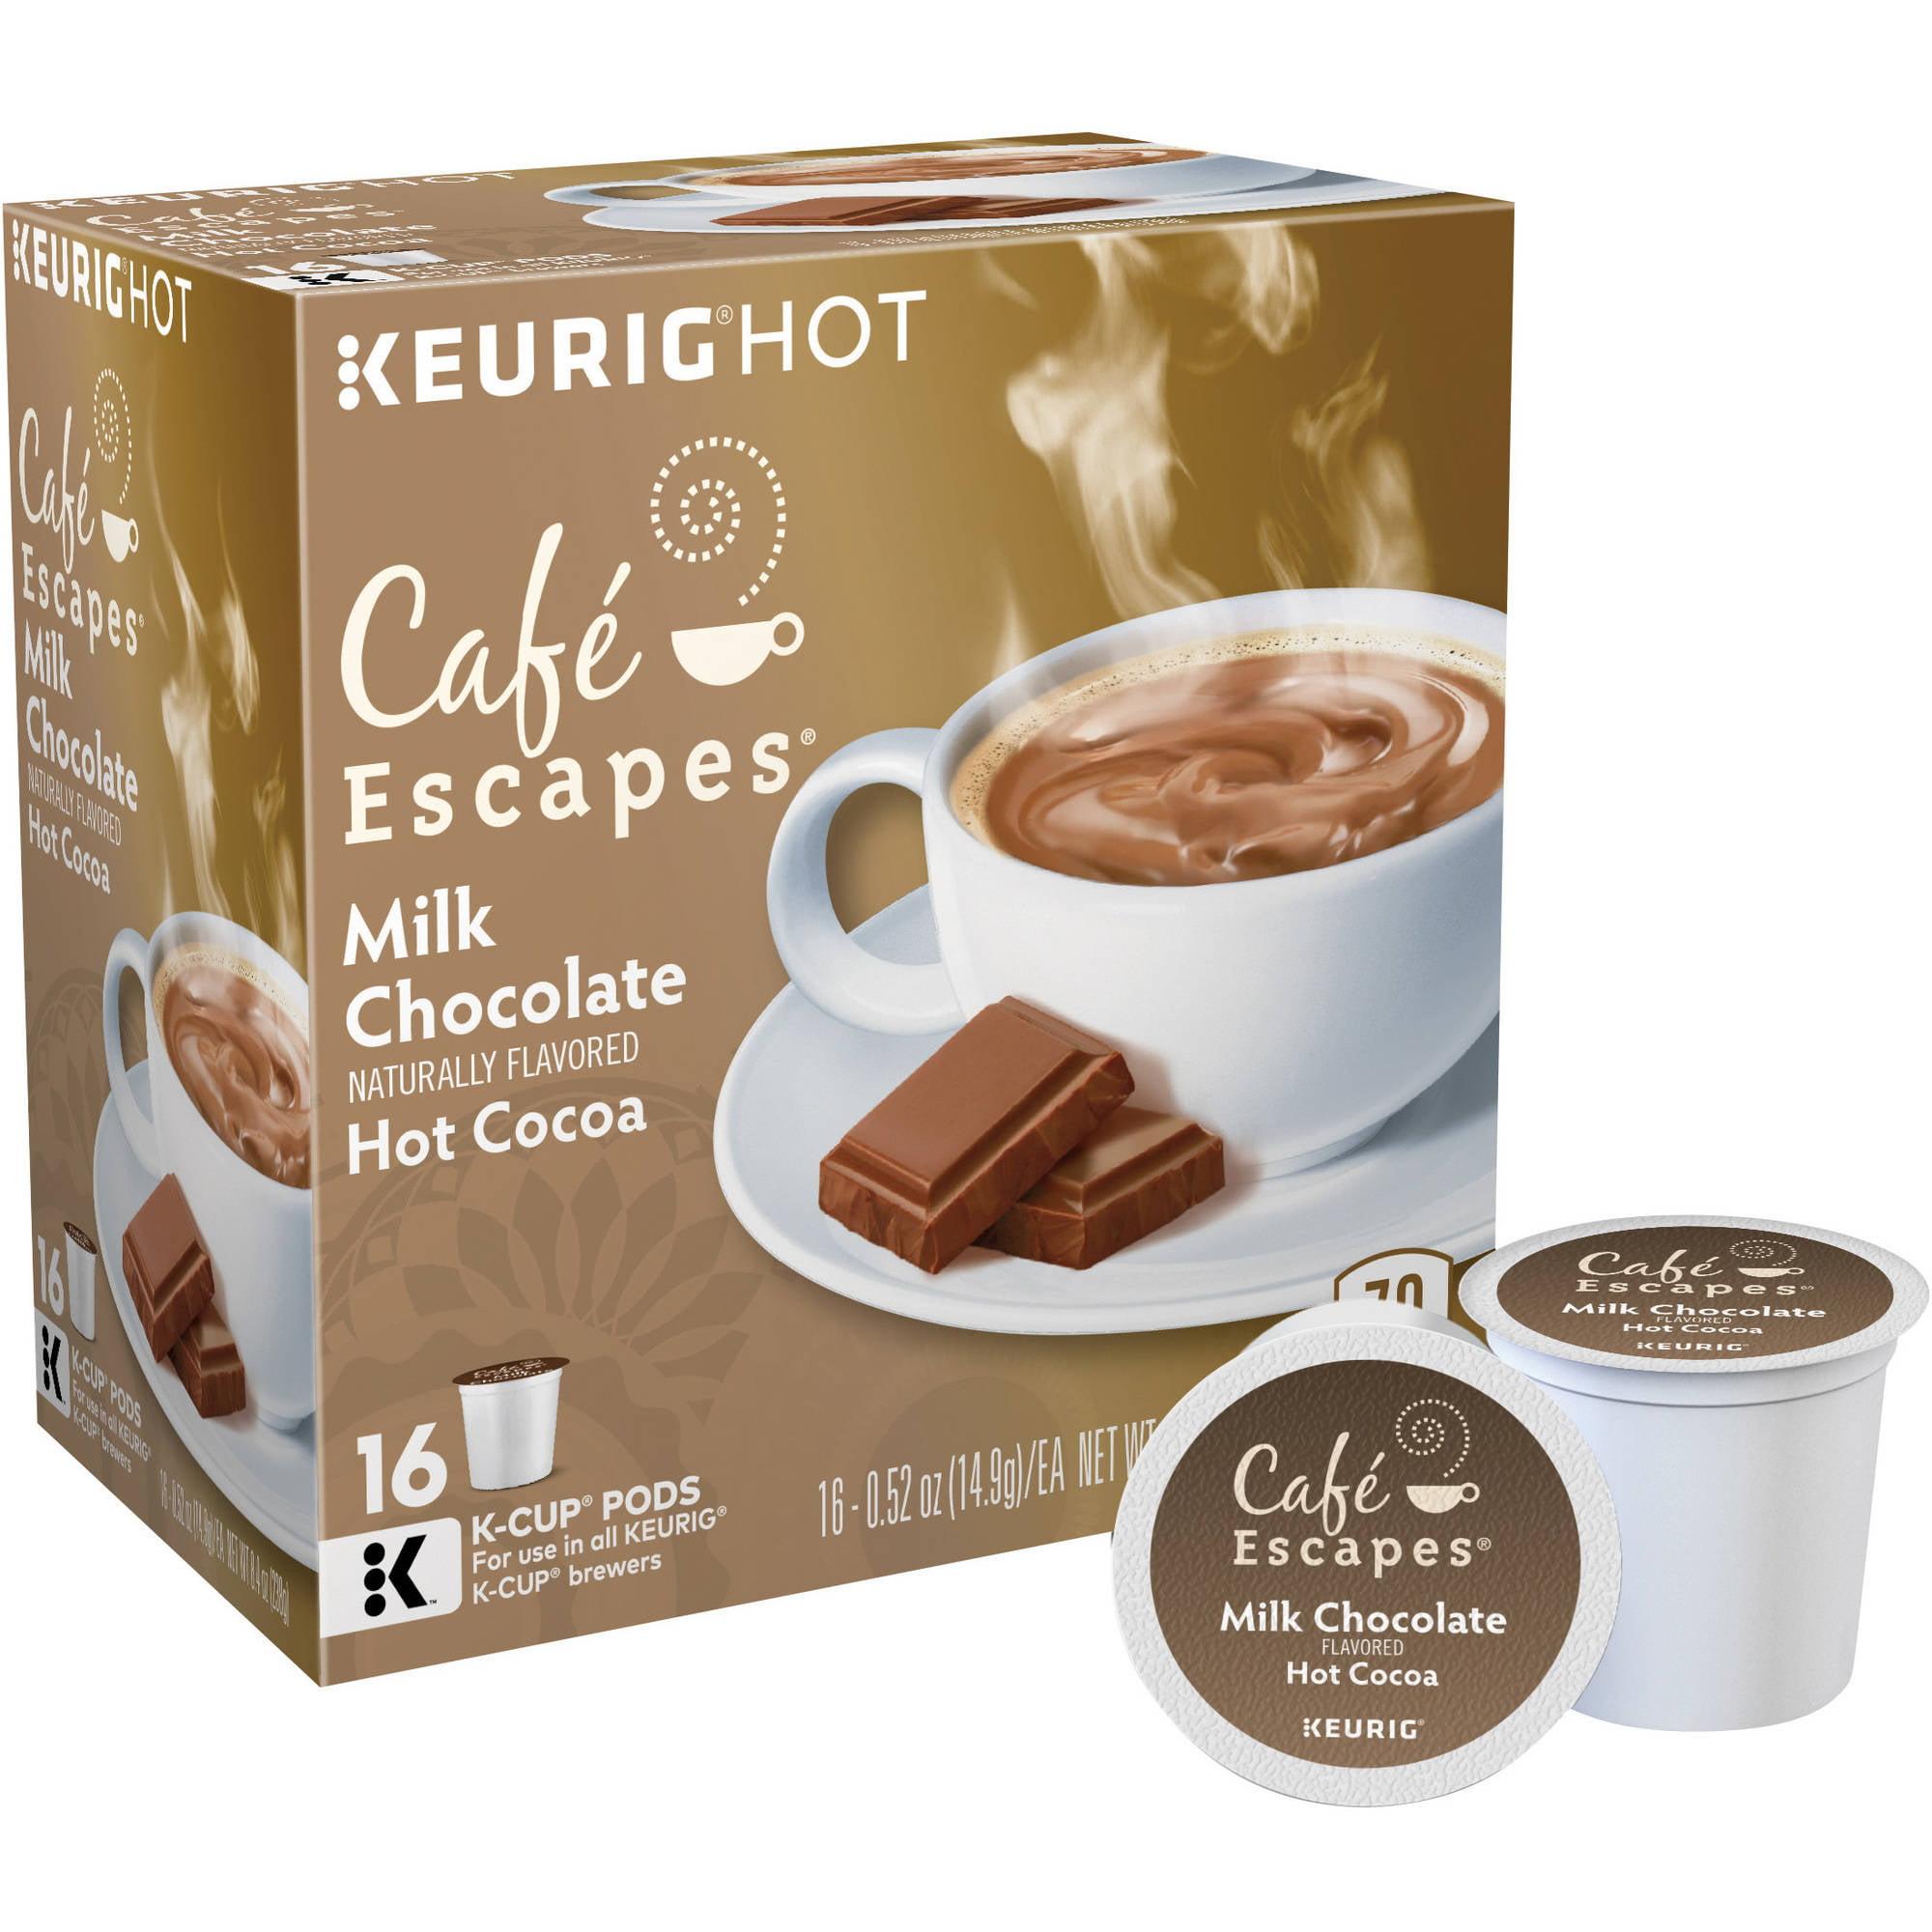 Keurig Green Mountain Cafe Escapes Milk Chocolate Cocoa, 16 count